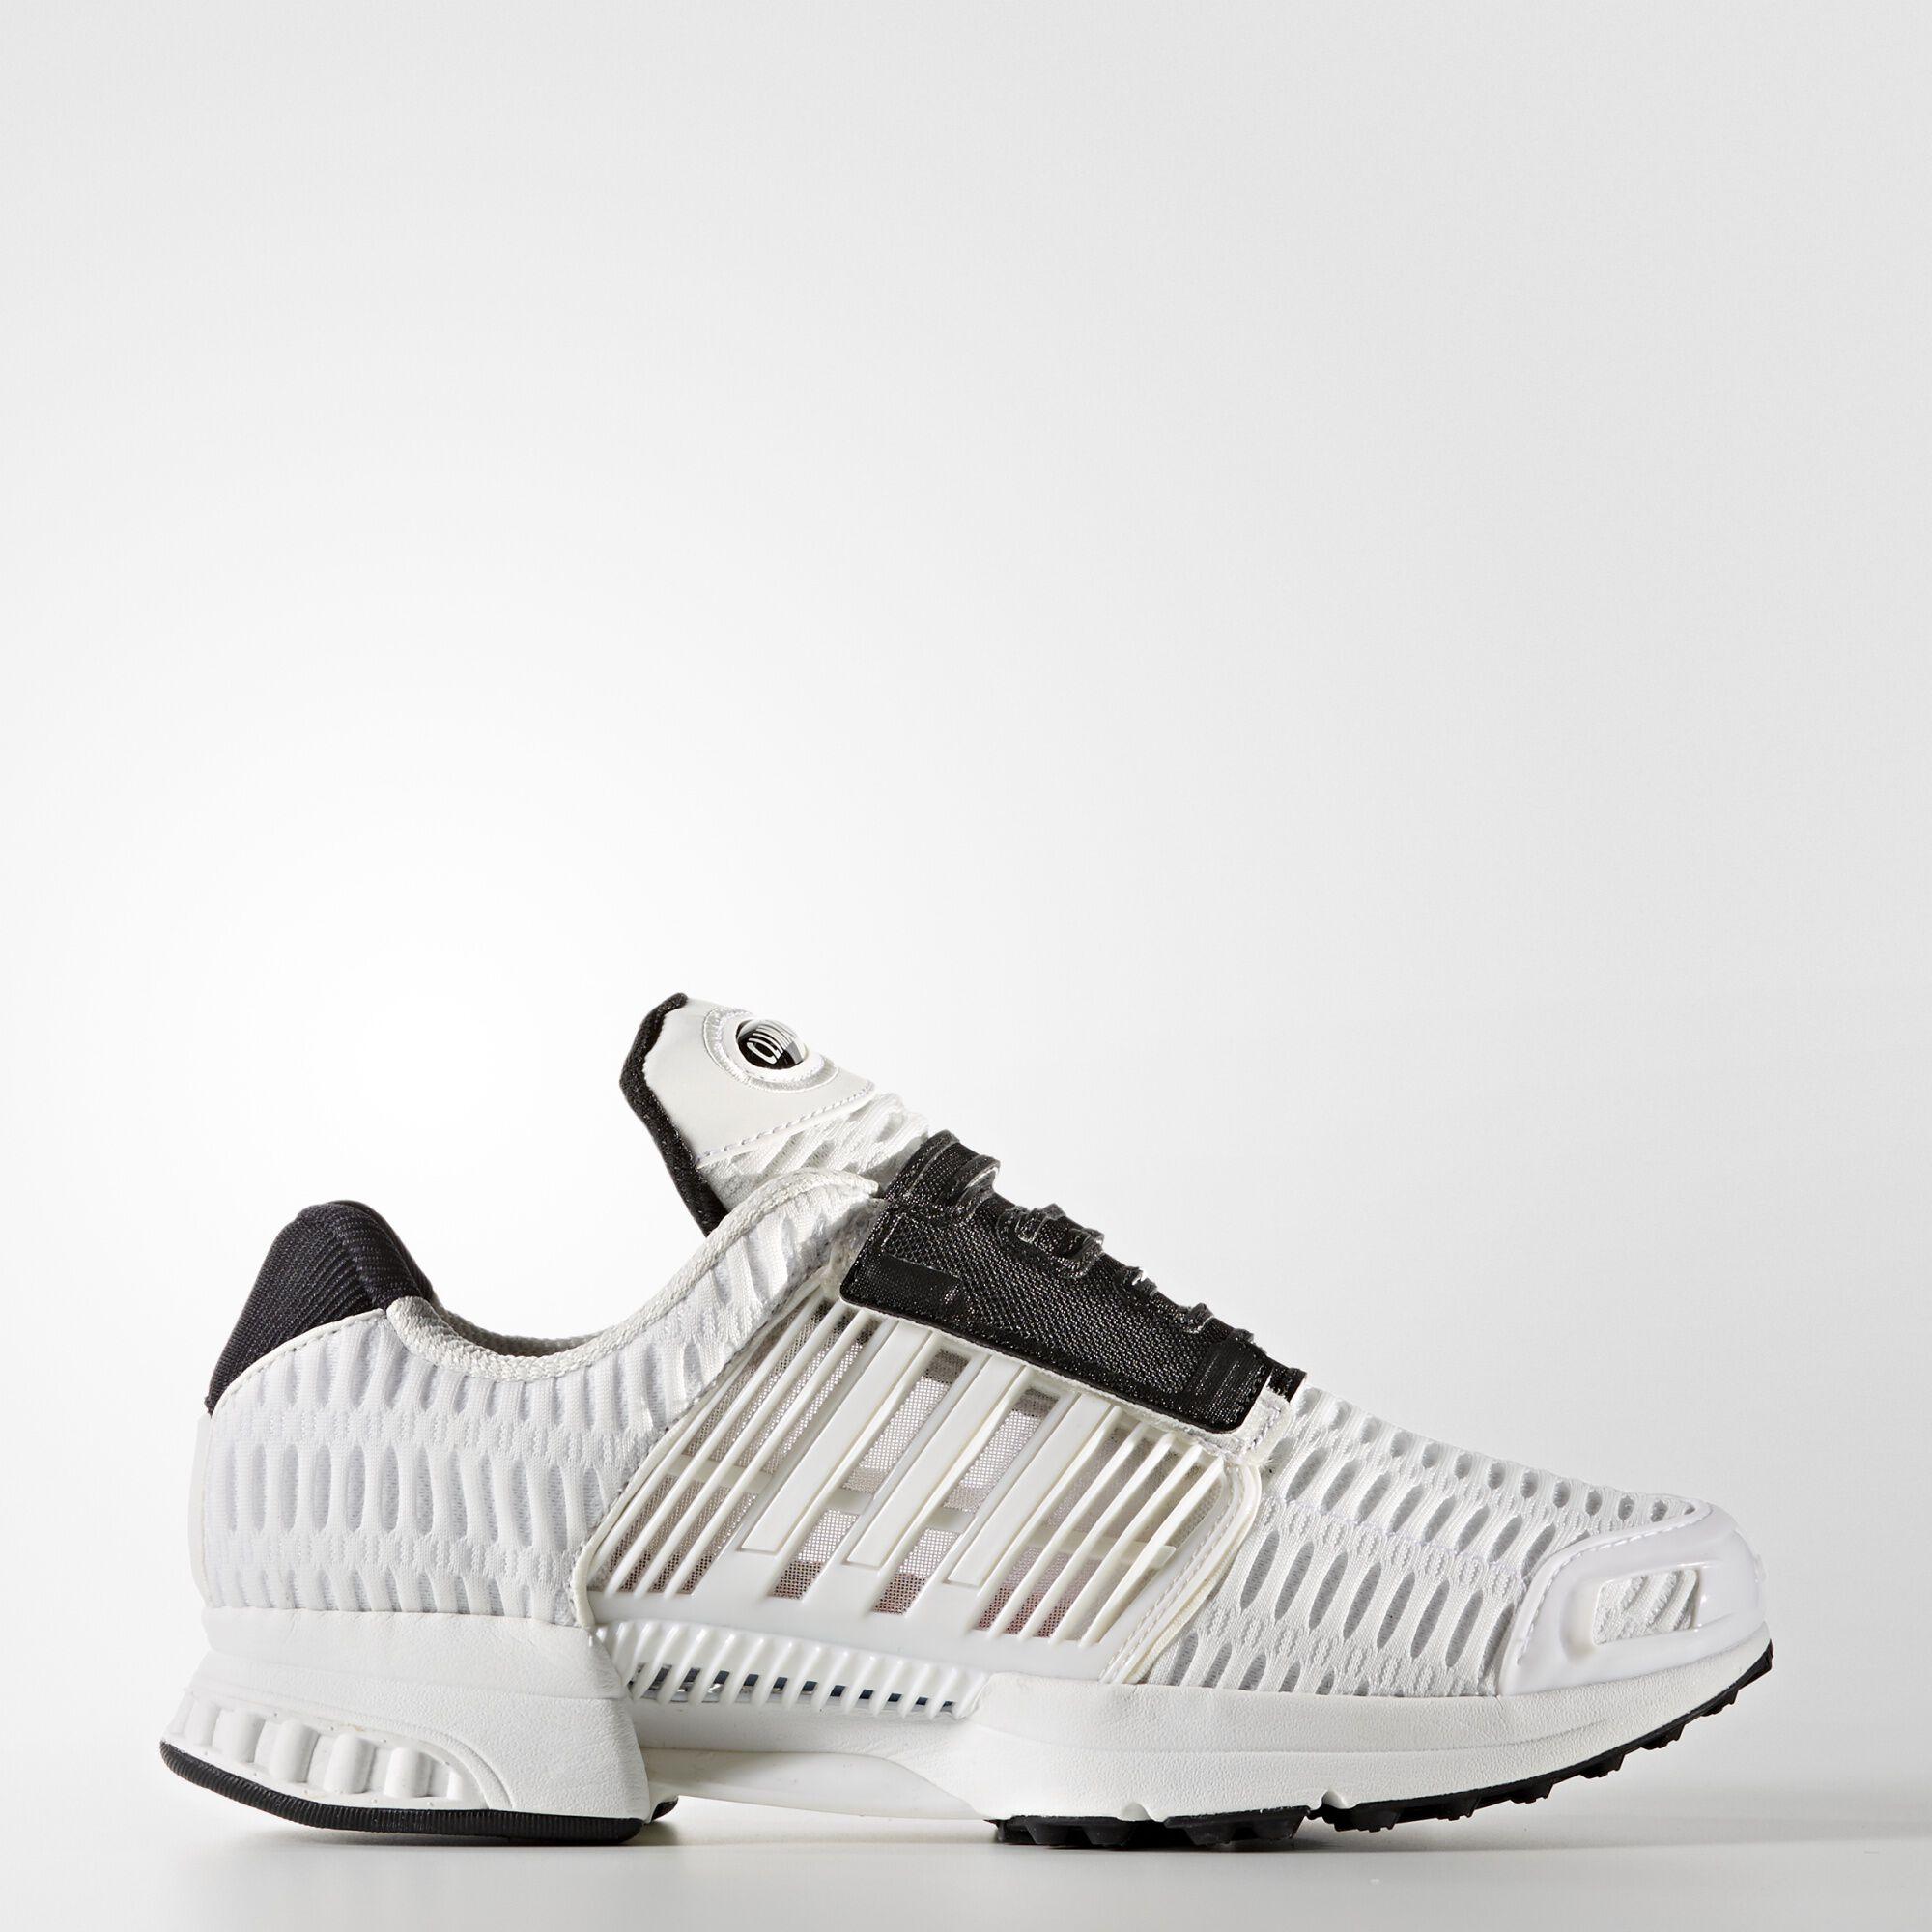 Buy adidas originals superstar 80s Uomo for sale >off53%)